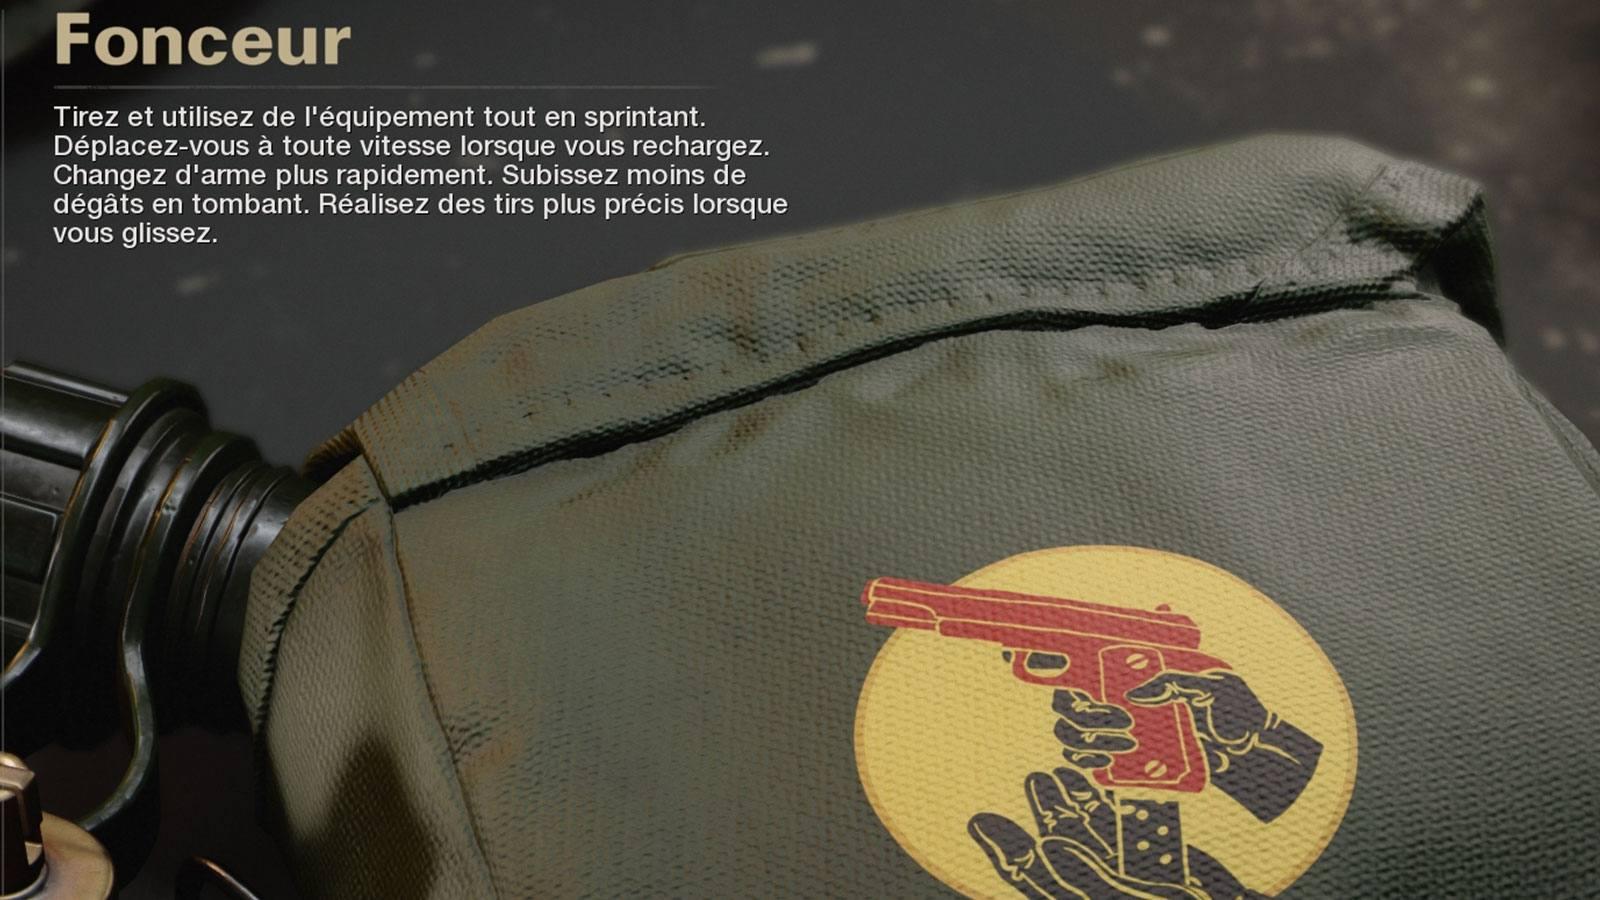 Atout Fonceur Black Ops Cold War Treyarch